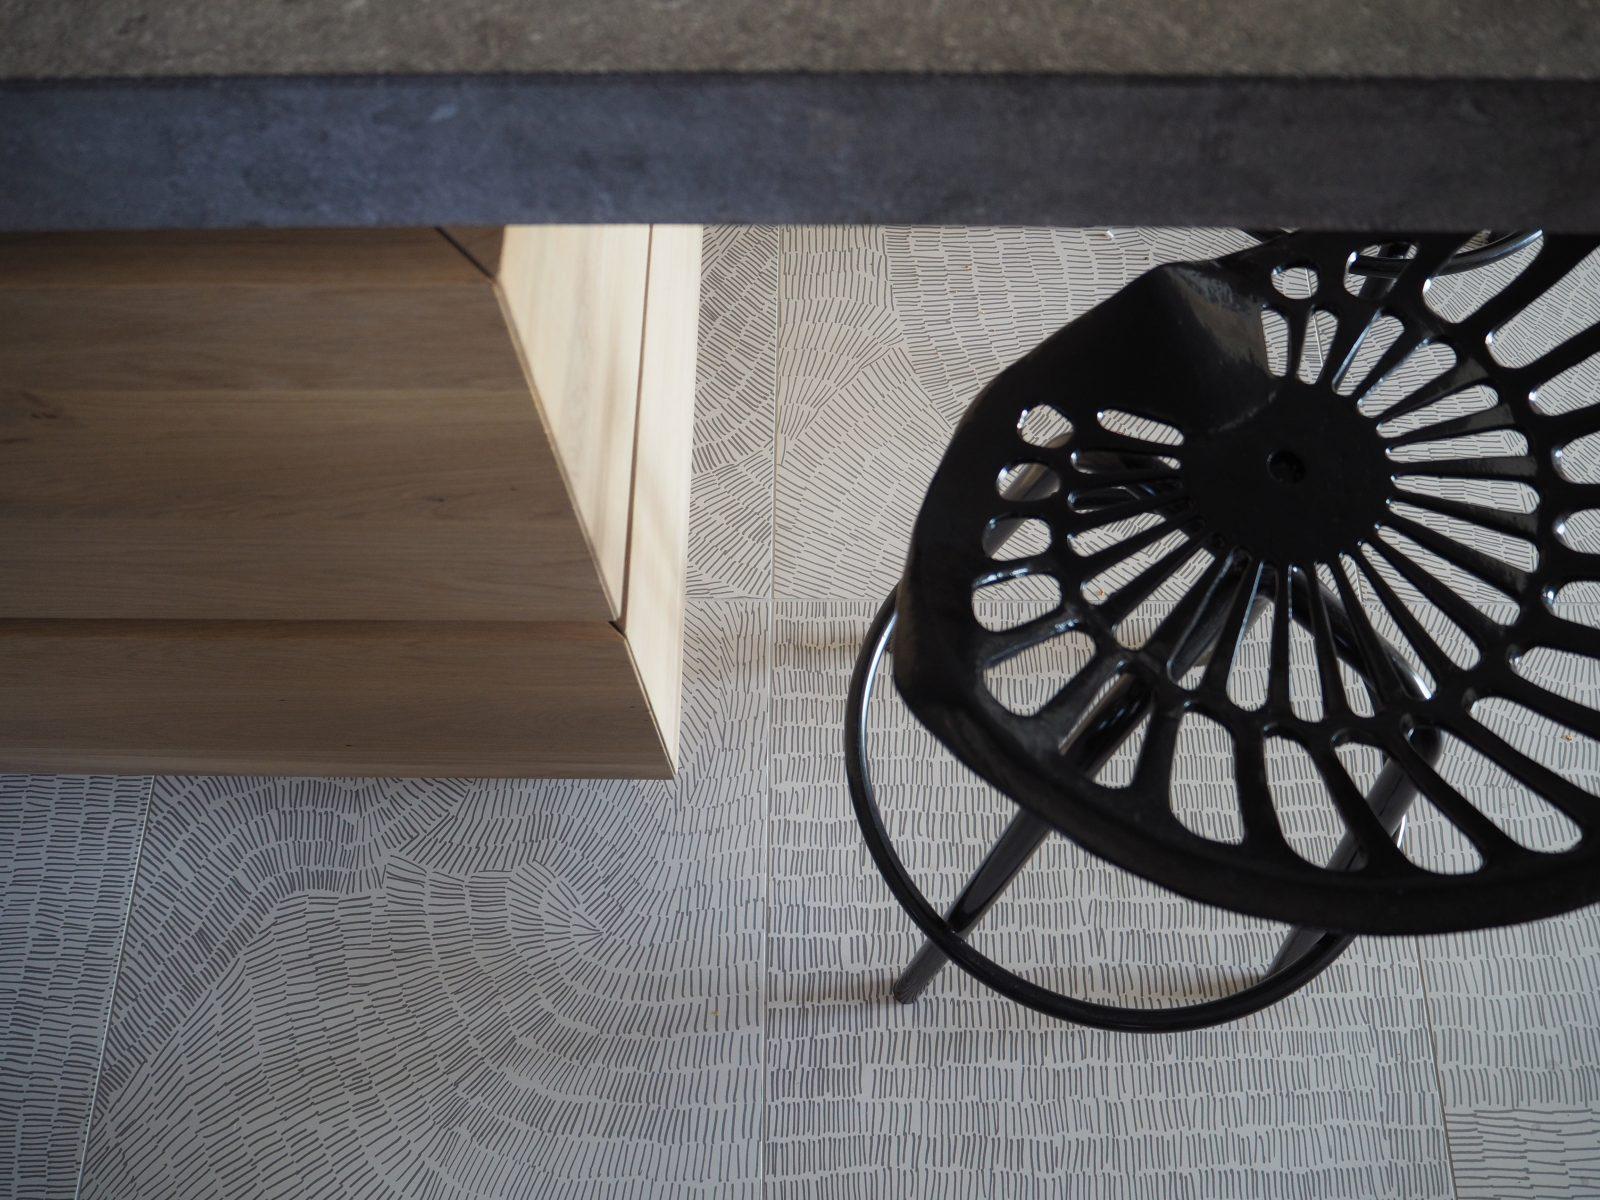 barstool_topview_kitchen_marble_brickwall_jeroendenijs_detail